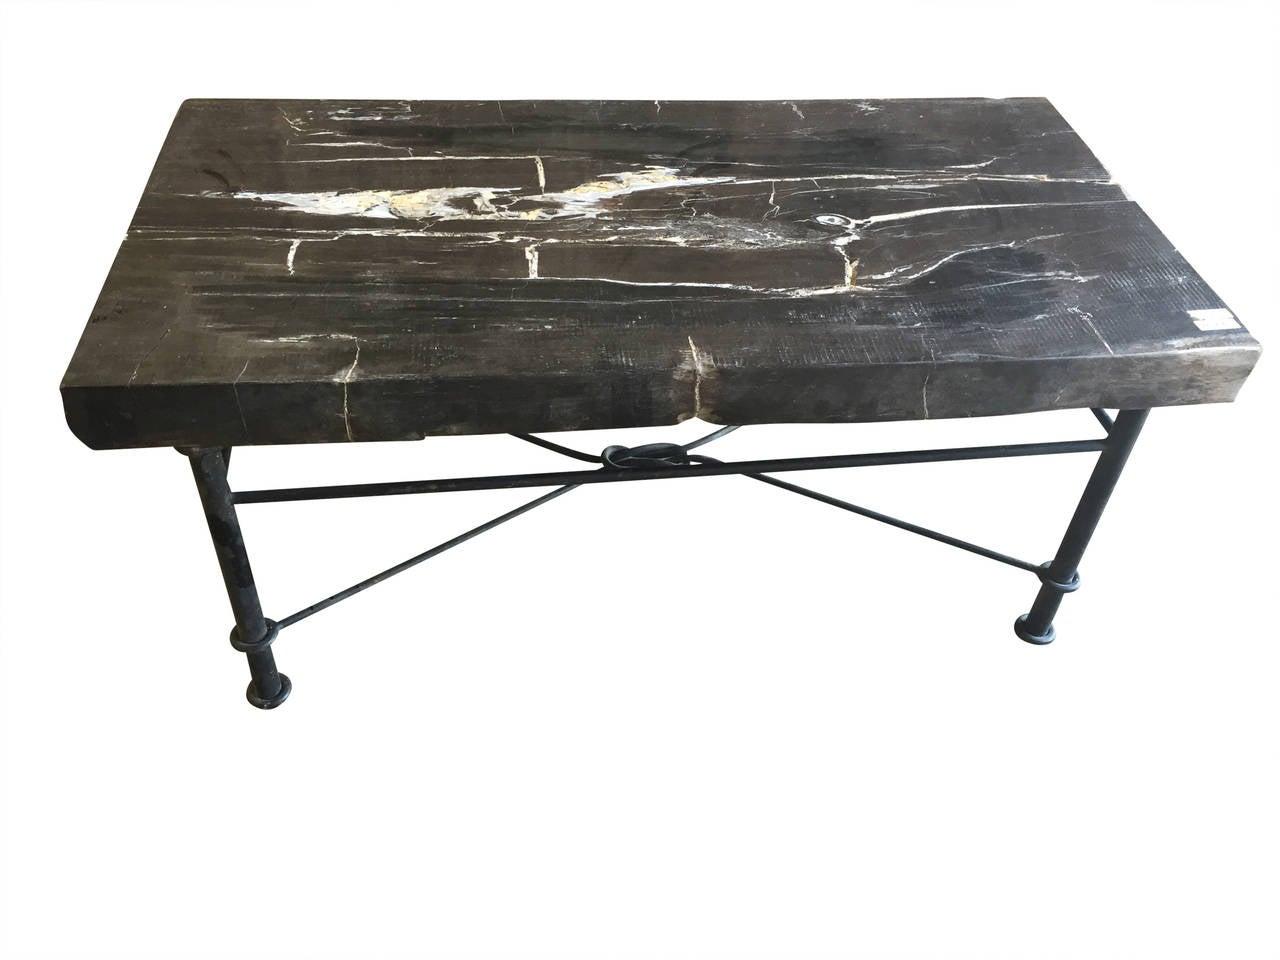 Petrified Wood Slab Coffee Table with Iron Base at 1stdibs